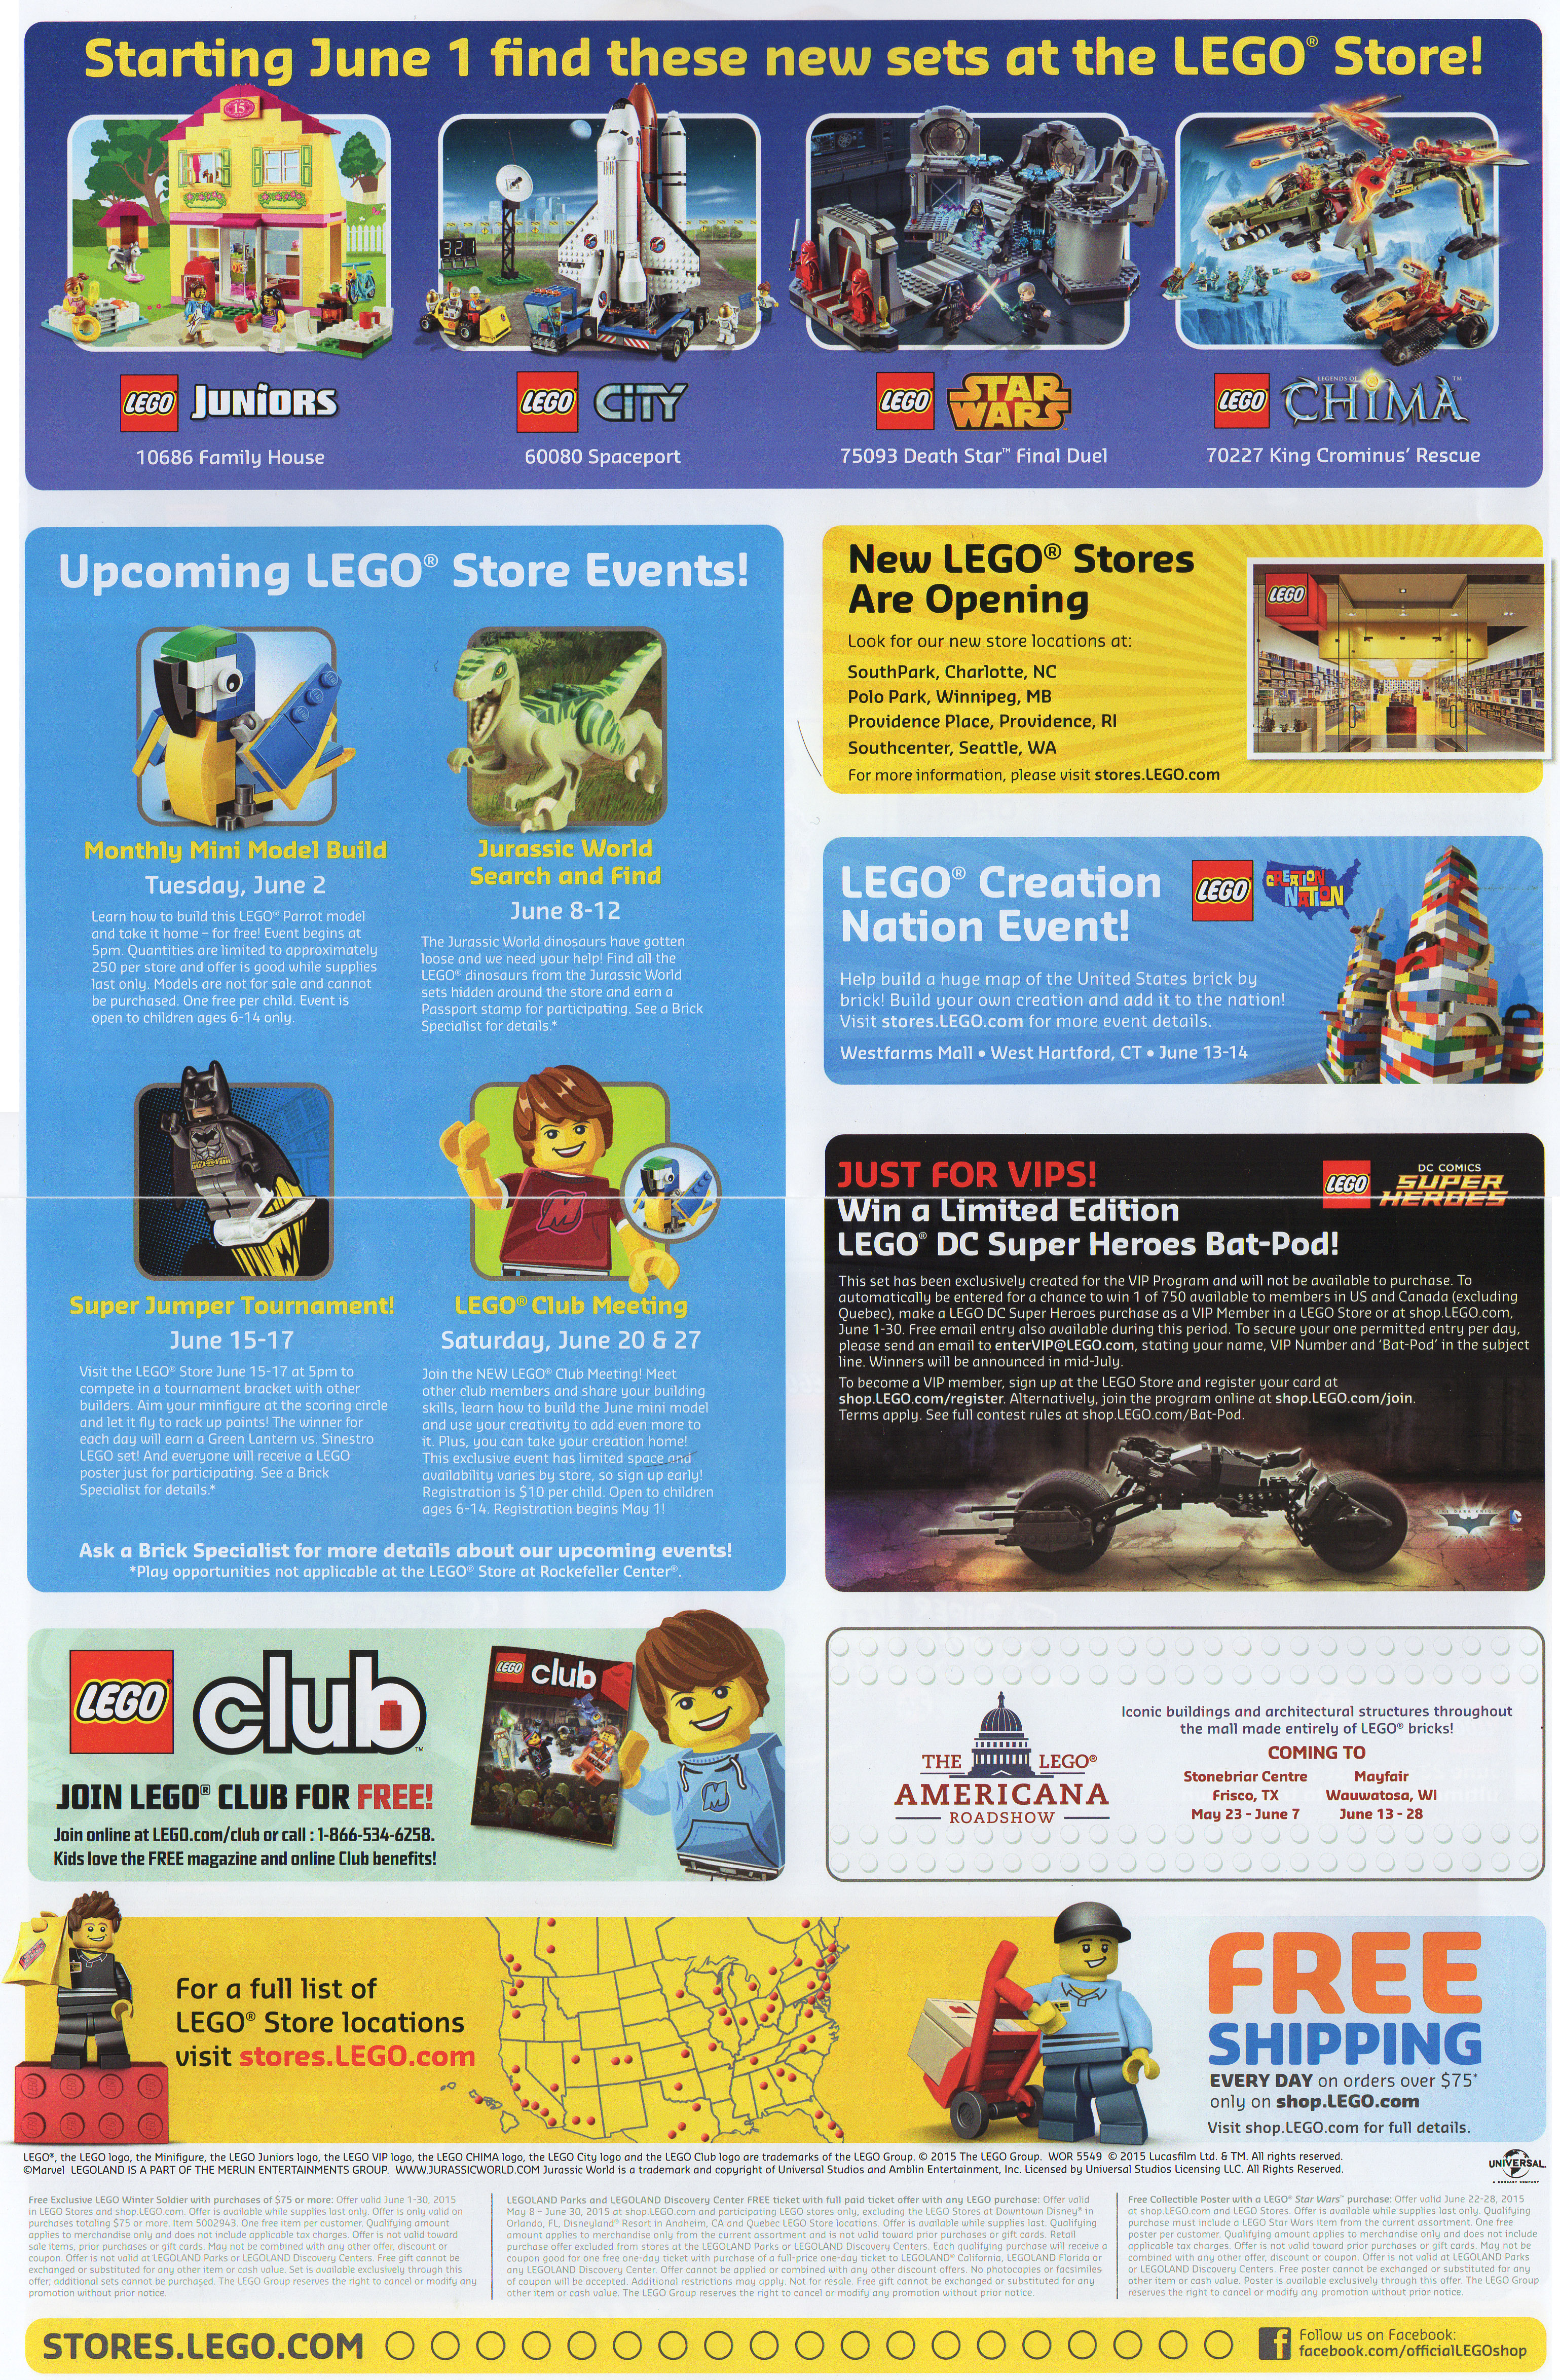 Calendar Lego June : June lego store calendar winter soldier minifigure